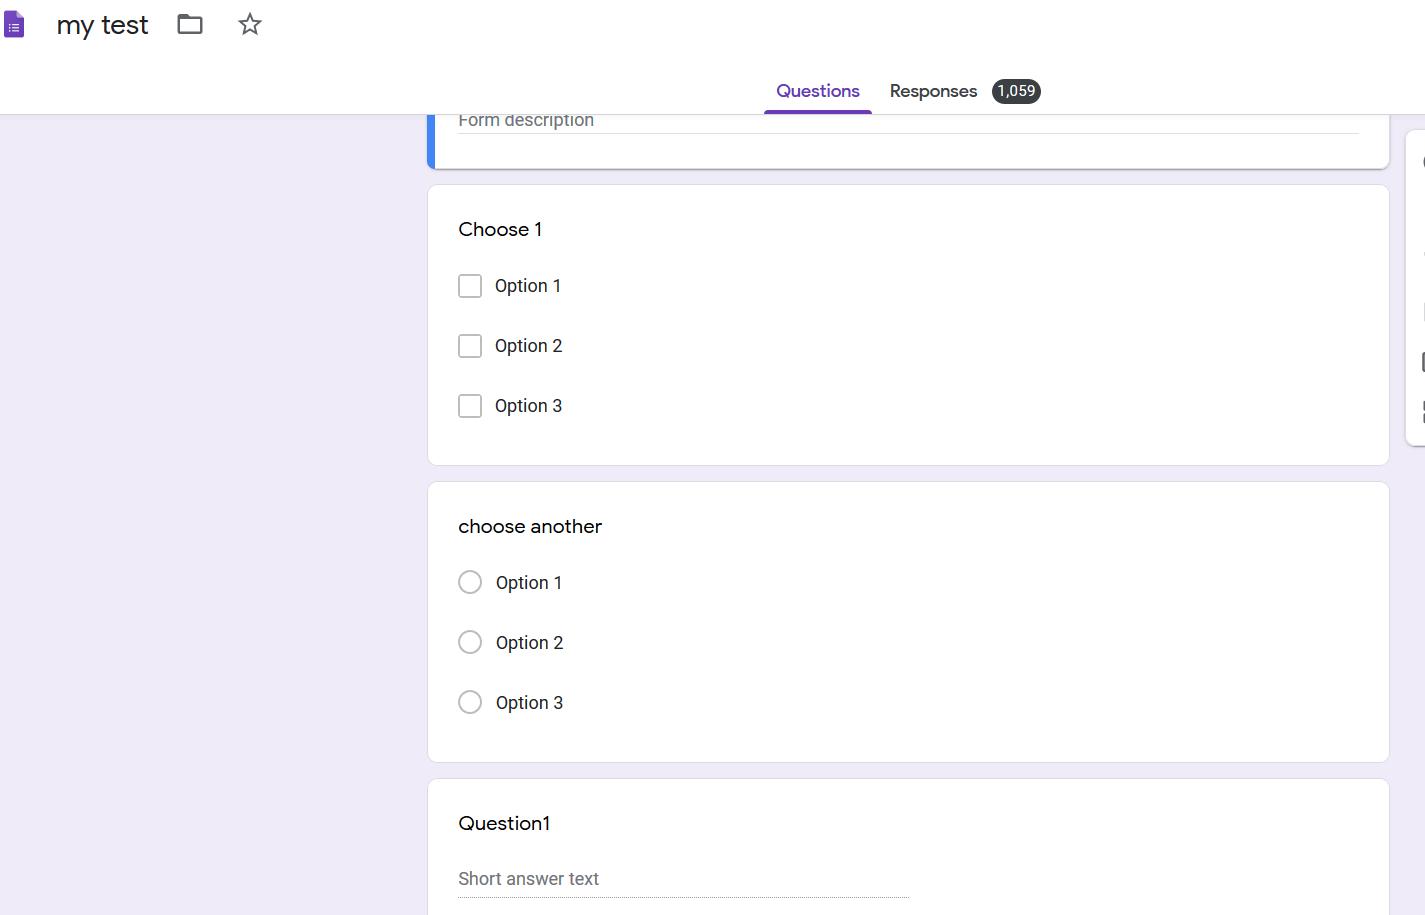 google form hack github GitHub - 2UC2F2R626/Google-Forms-Spam: MultiThreaded spammer, 200